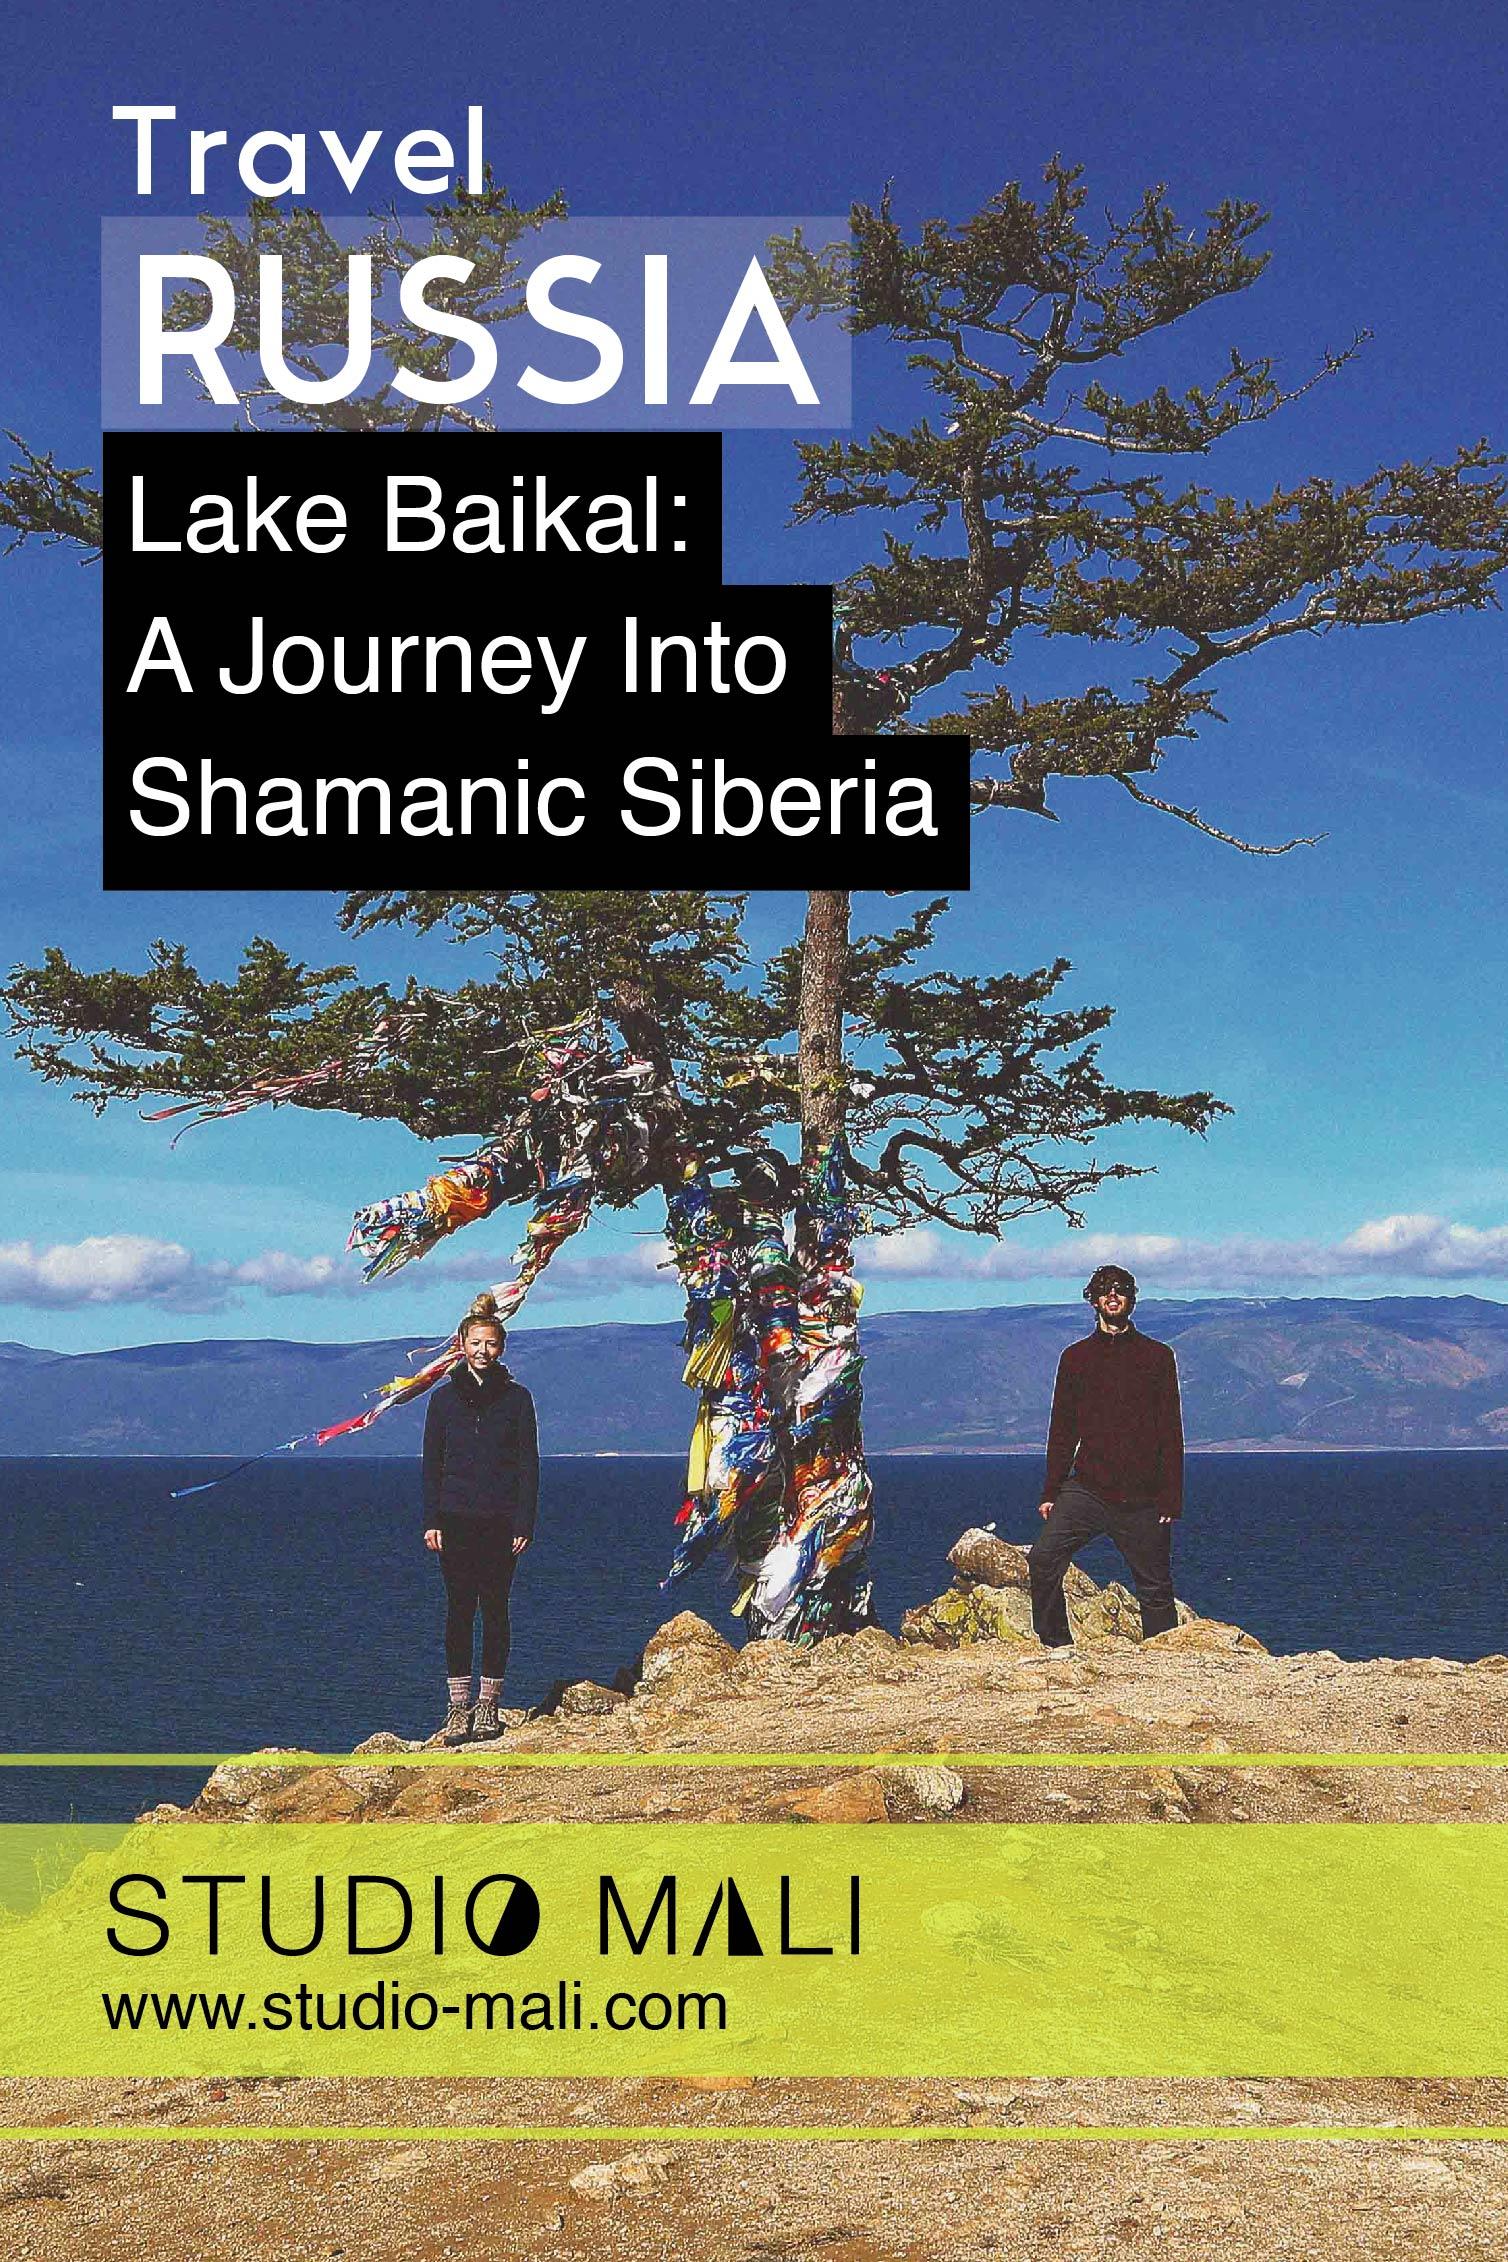 Russia - Lake Baikal, A Journey Into Shamanic Siberia, by Studio Mali.jpg